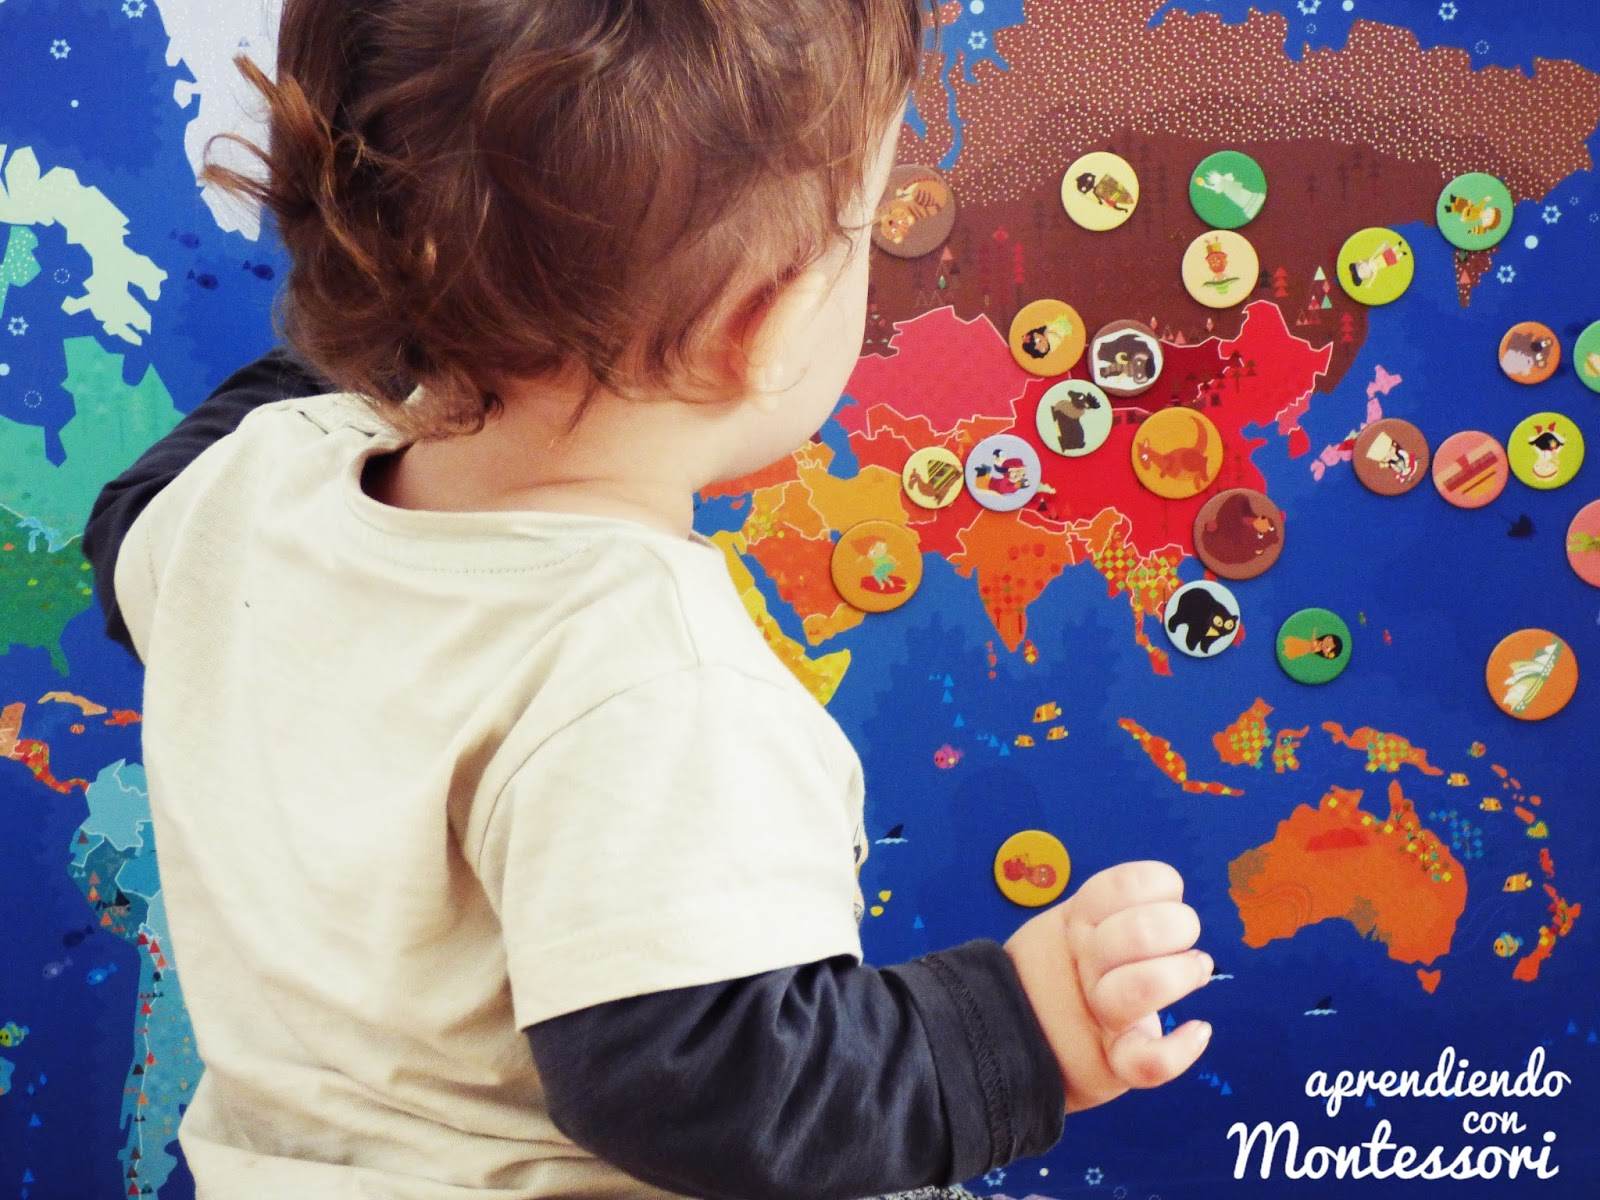 92e2ac21f62 mapa de los continentes archivos - Aprendiendo con Montessori